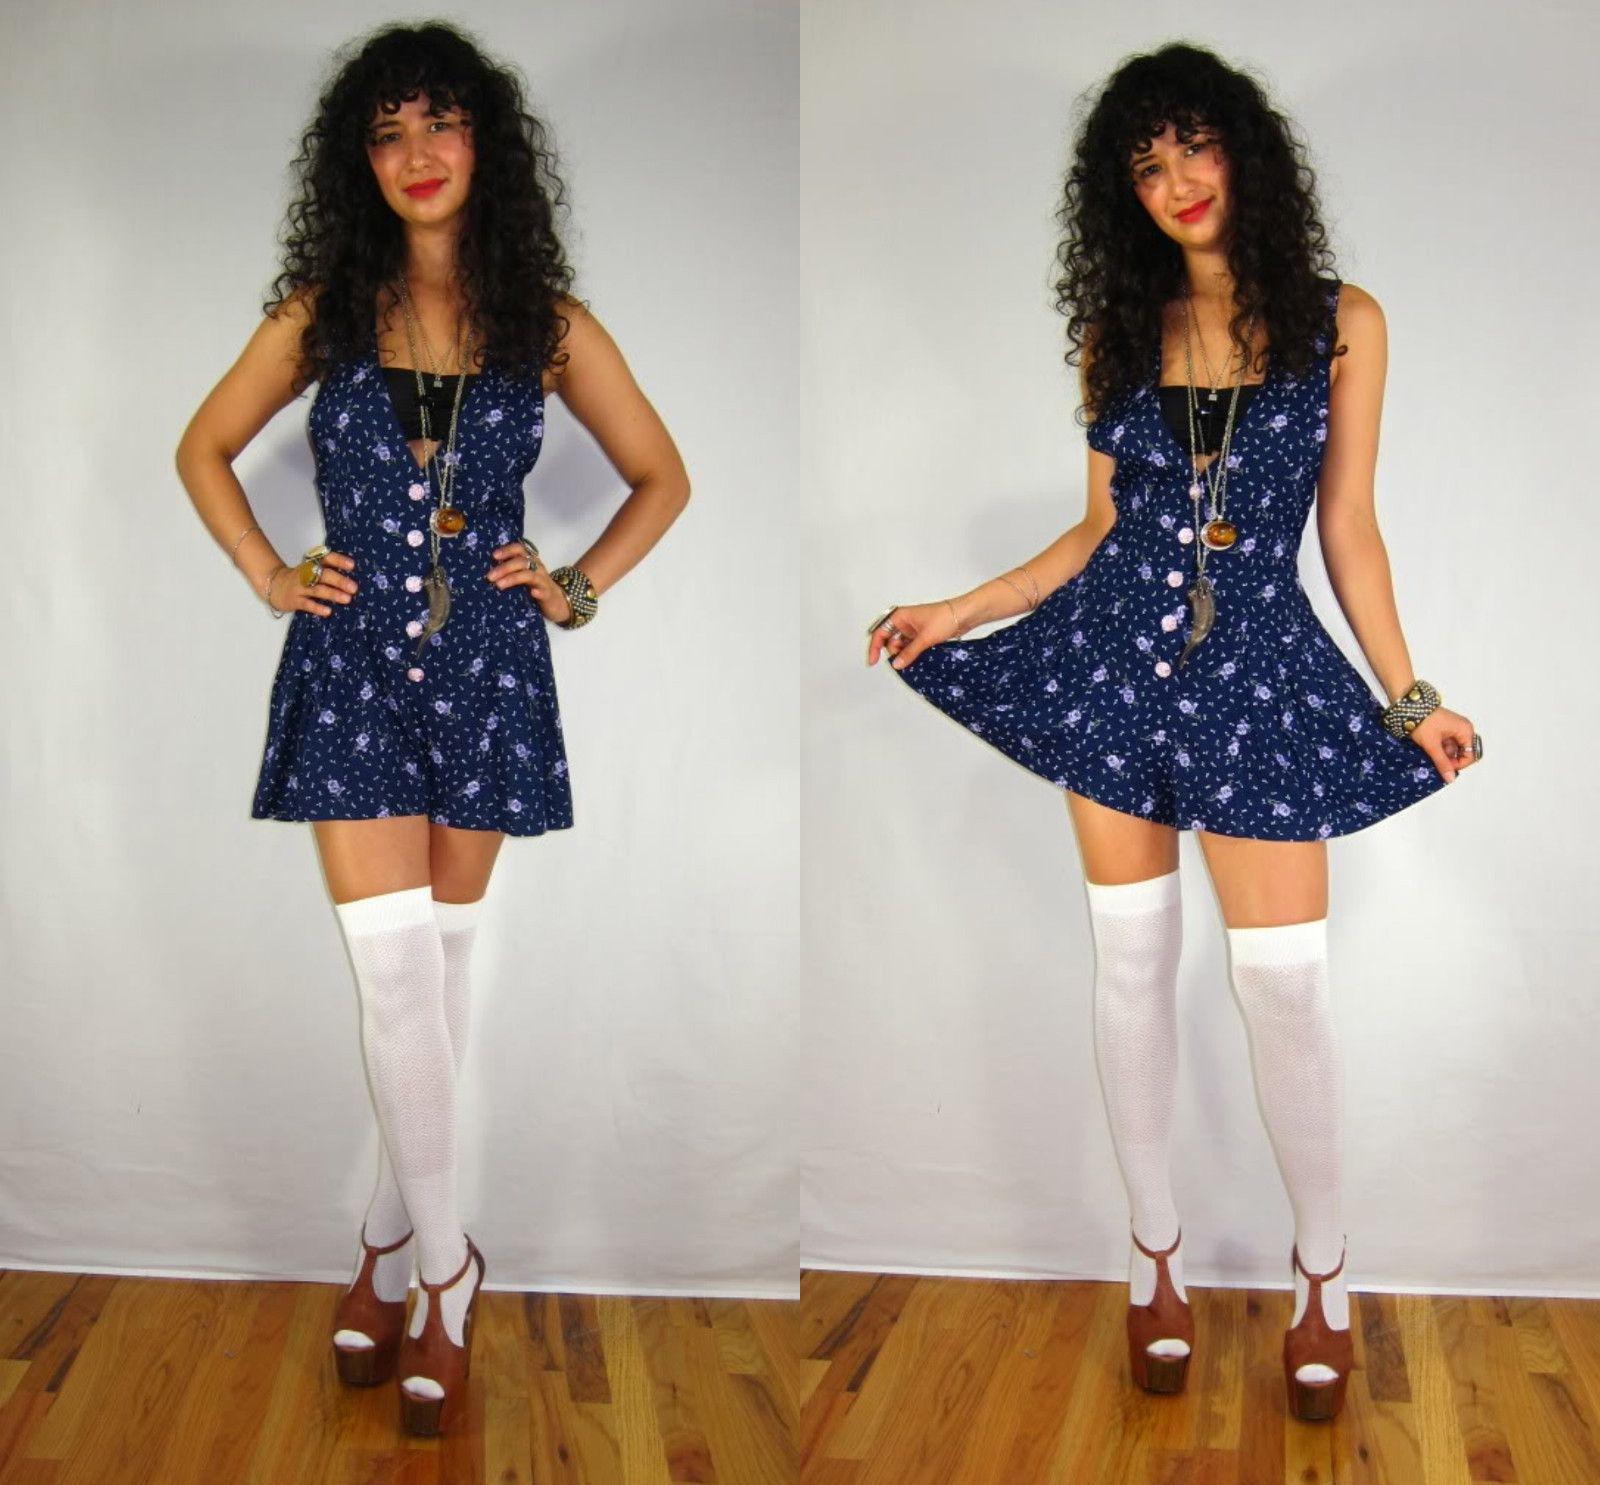 d8fd8e1c6d3 Vintage 80s BABYDOLL Navy Blue FLORAL Rose School Girl ROMPER ONESIE  PLAYSUIT Shorts